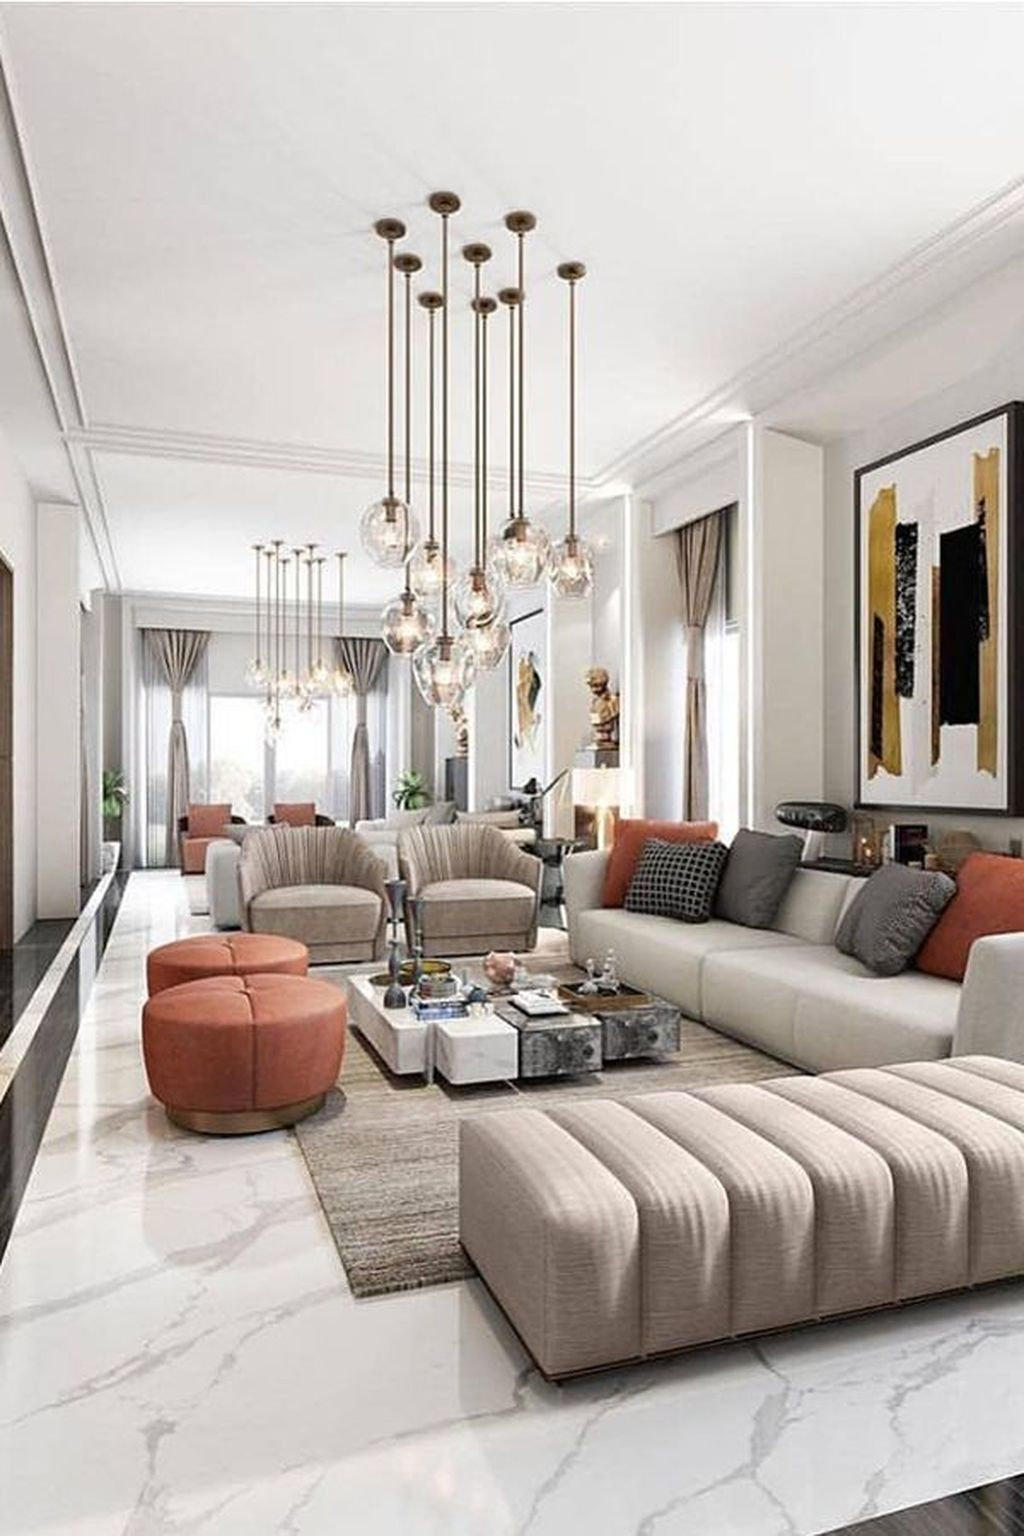 45 Incredible Living Room Design Ideas Living Room Design Modern Luxury Living Room Contemporary Living Room Contemporary living room decor